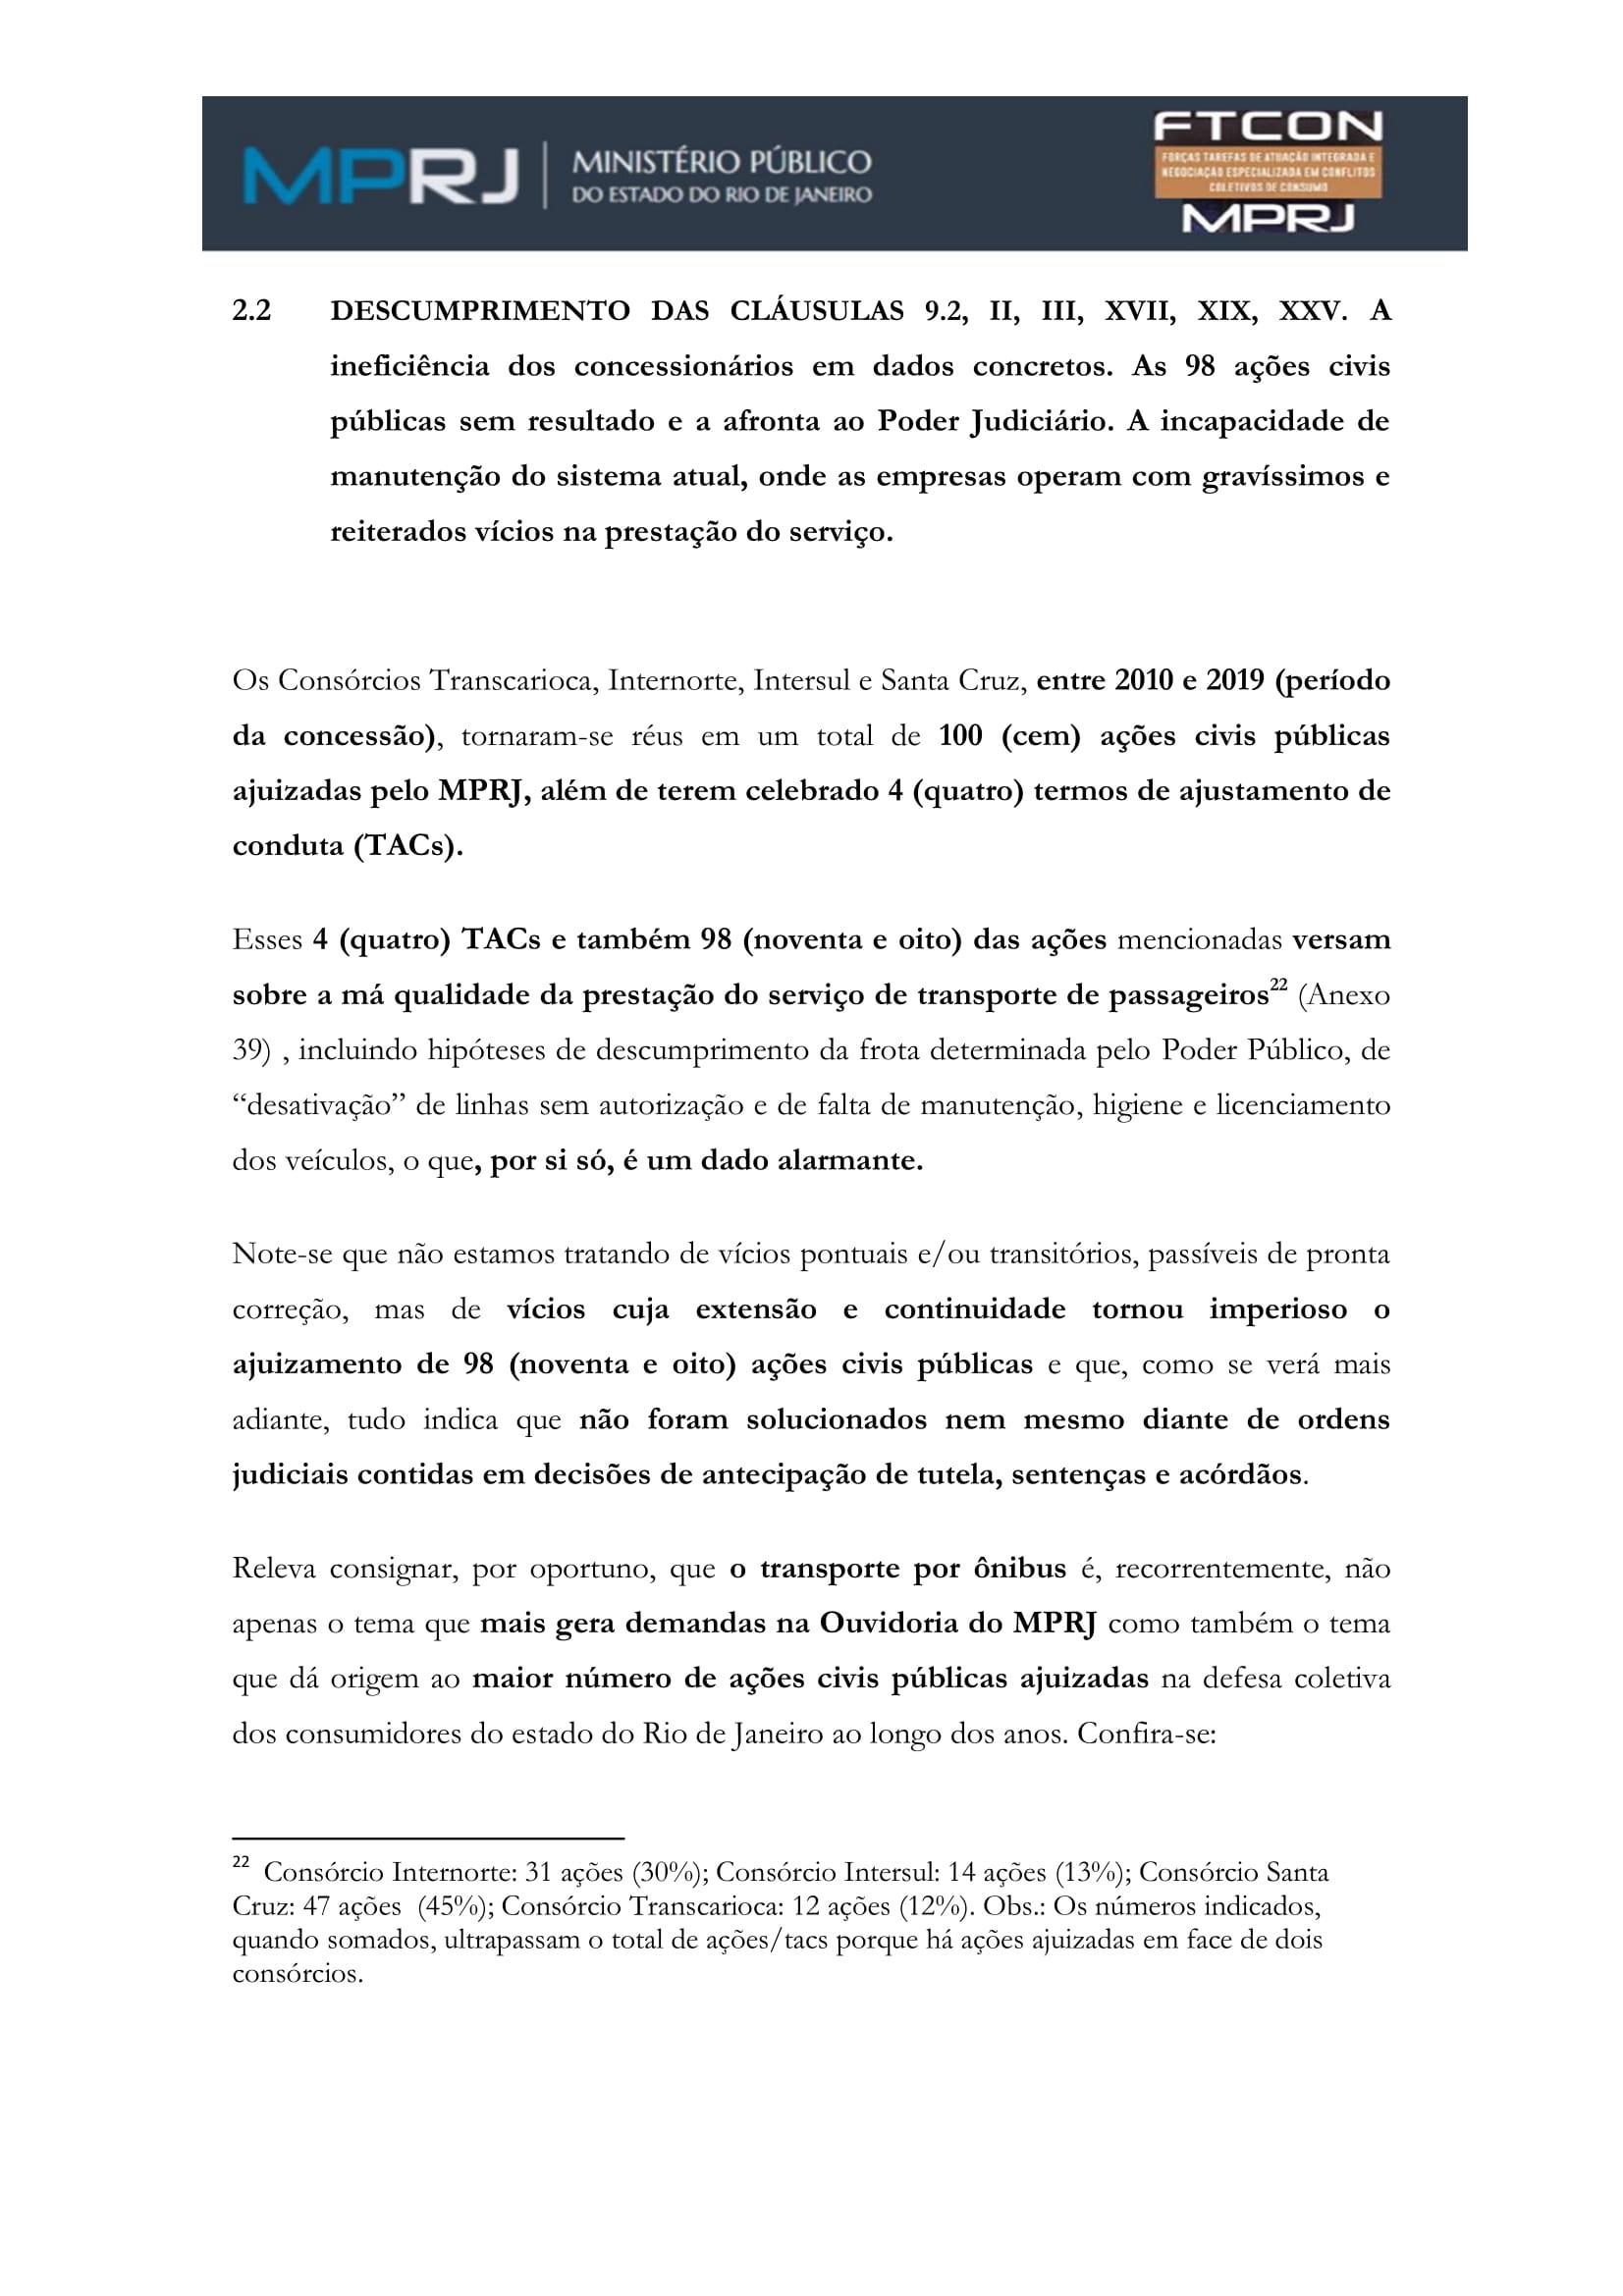 acp_caducidade_onibus_dr_rt-022